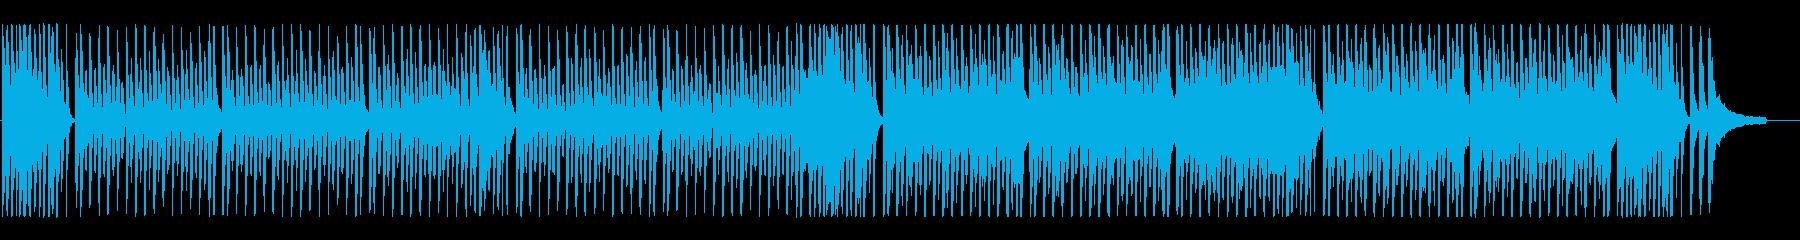 The Bouncy Popの再生済みの波形